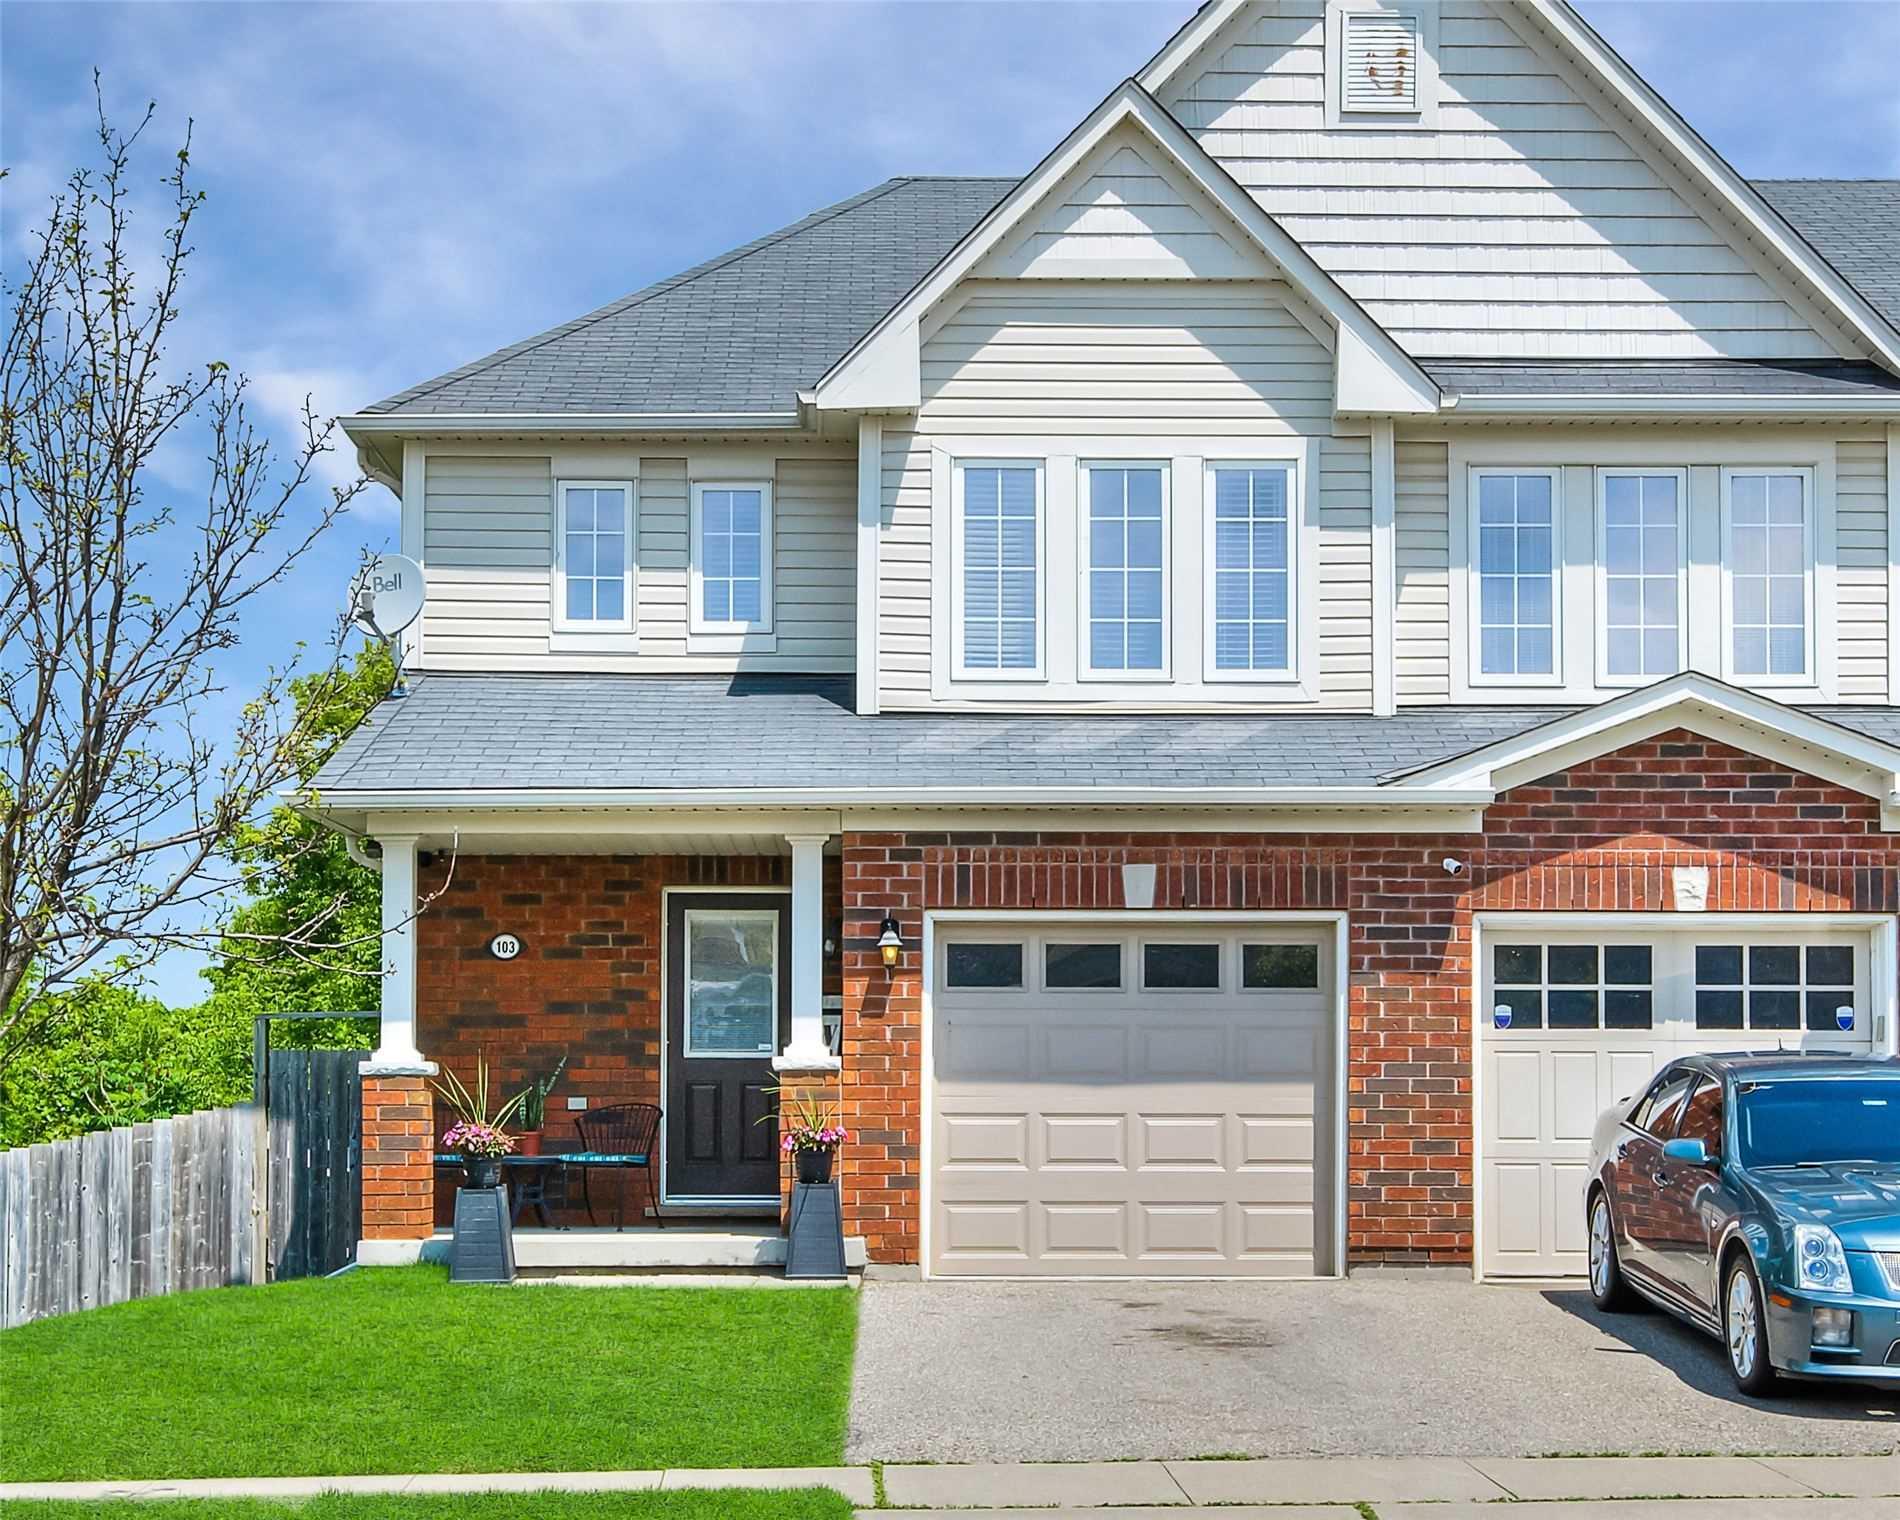 103 Bloomington Dr, Cambridge, Ontario N1P 1J6, 3 Bedrooms Bedrooms, ,2 BathroomsBathrooms,Att/row/twnhouse,For Sale,Bloomington,X5273598